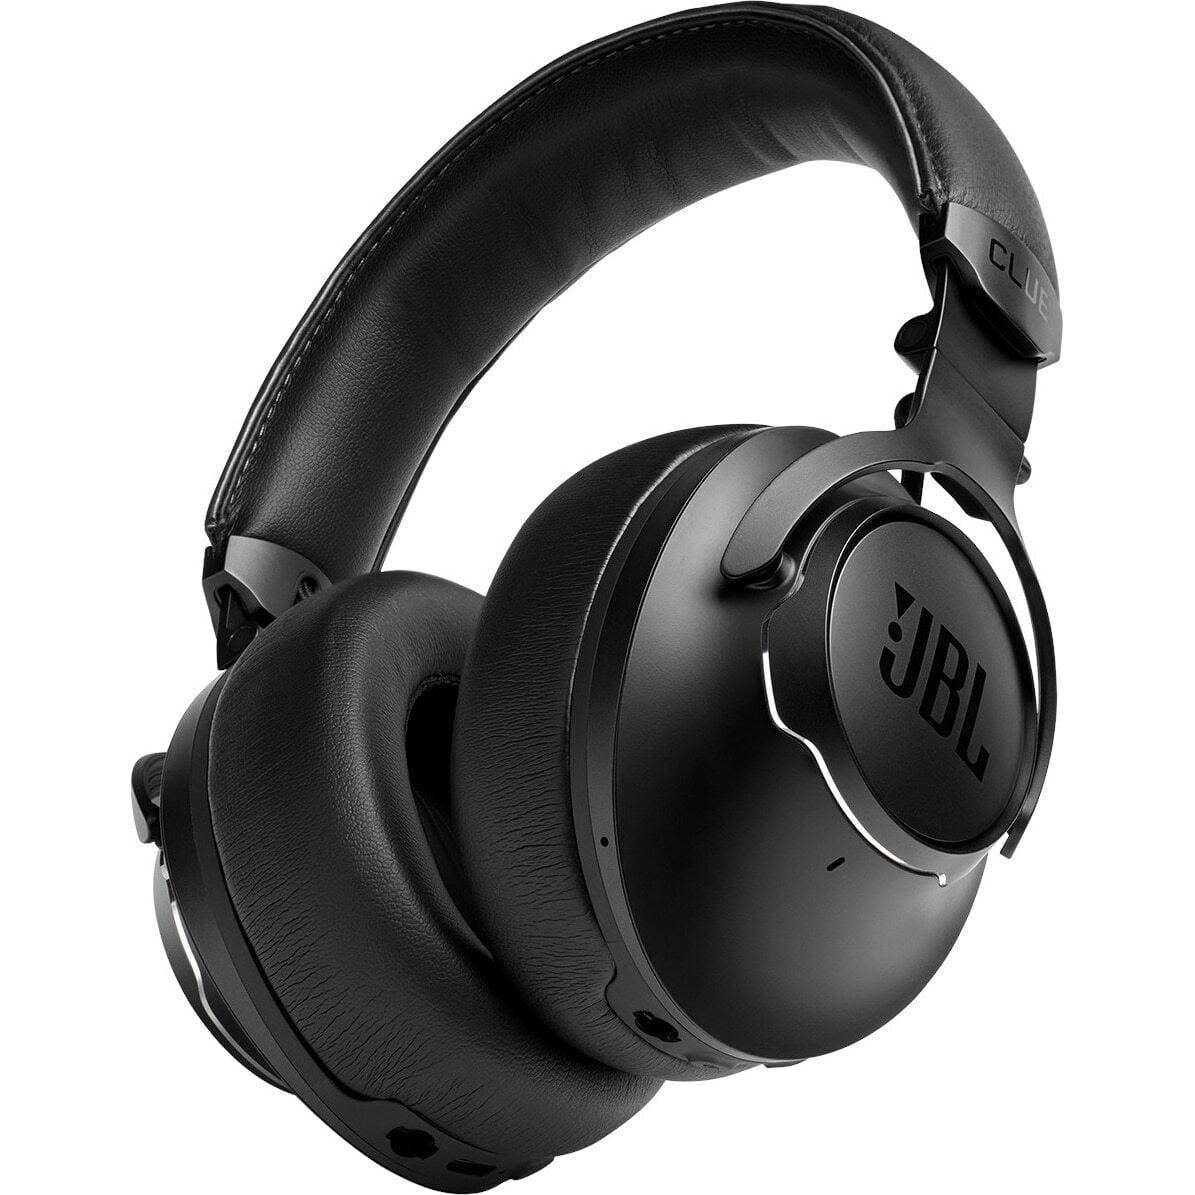 Casti audio Over-Ear JBL Club One, Wireless, Bluetooth, Noise cancelling, 45h, Black